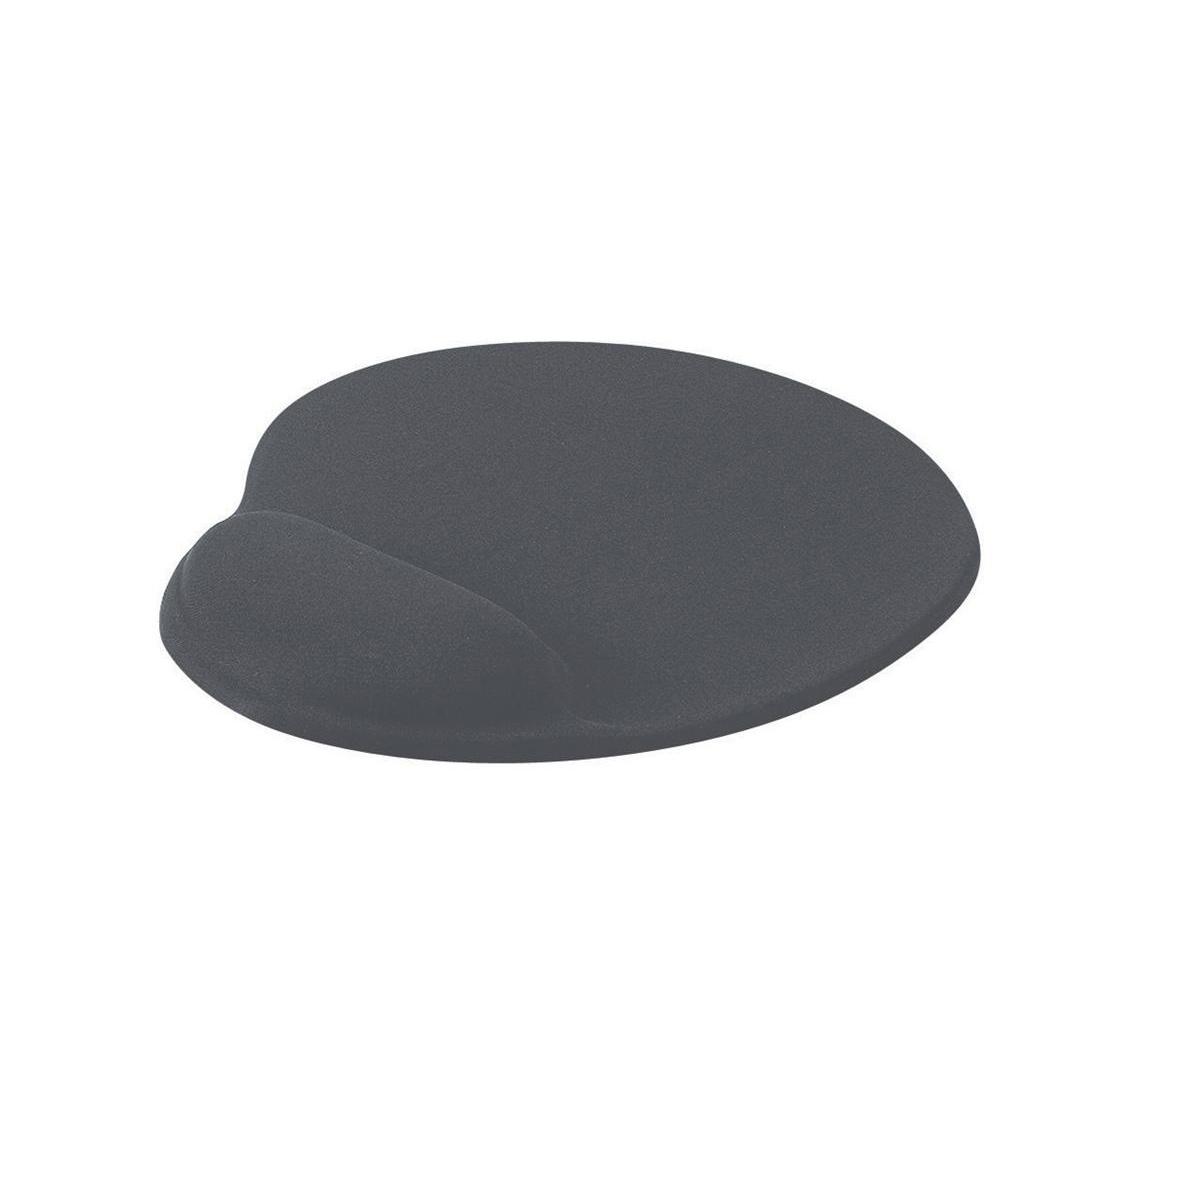 Mouse Mats Mouse Mat Ergonomic Non Slip with Gel Wrist Rest Charcoal